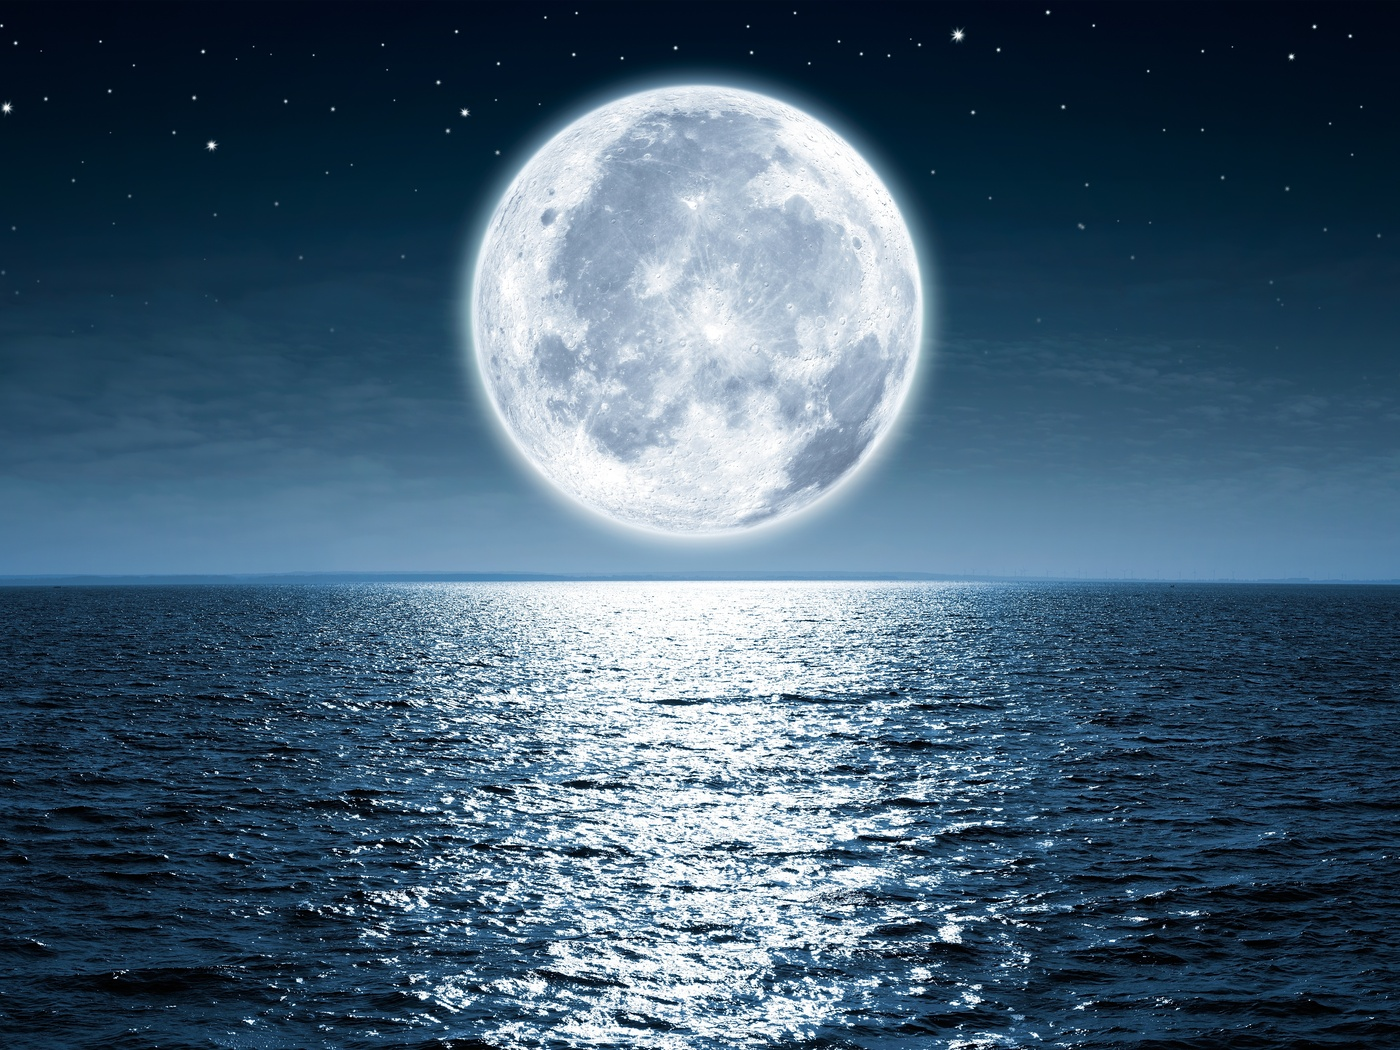 moon-sea-night-5k-bk.jpg